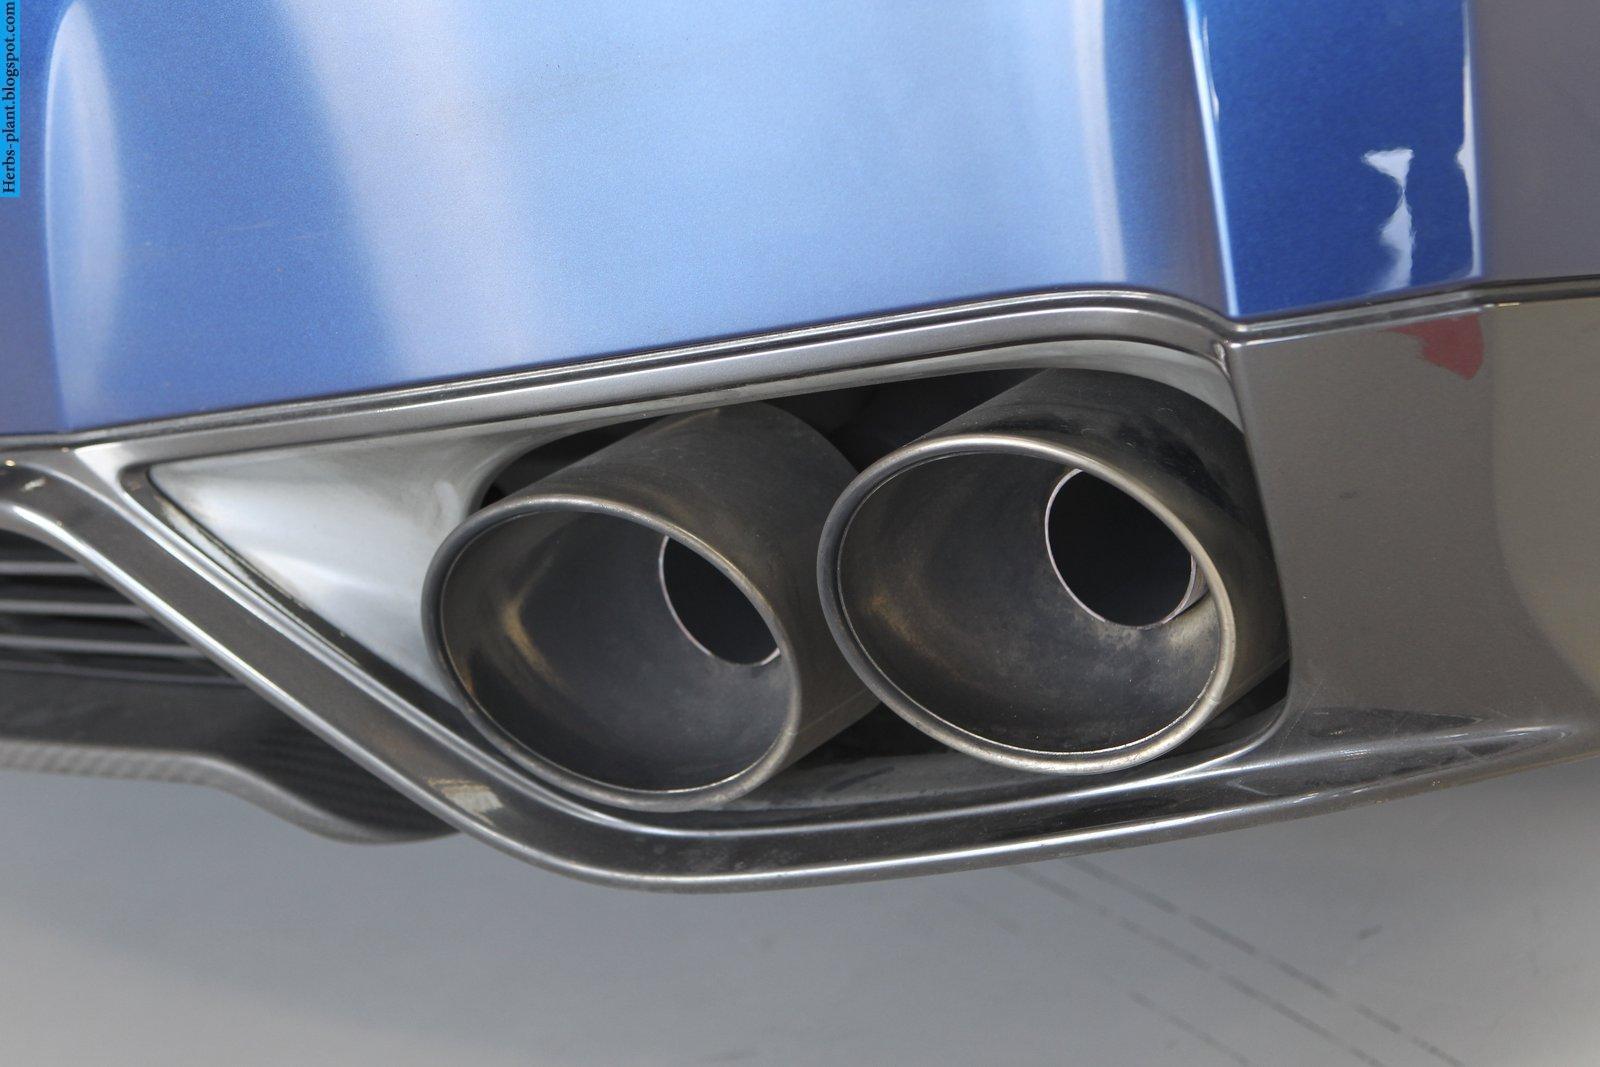 Nissan GT-R car 2013 exhaust - صور شكمان سيارة نيسان جي تي ار 2013